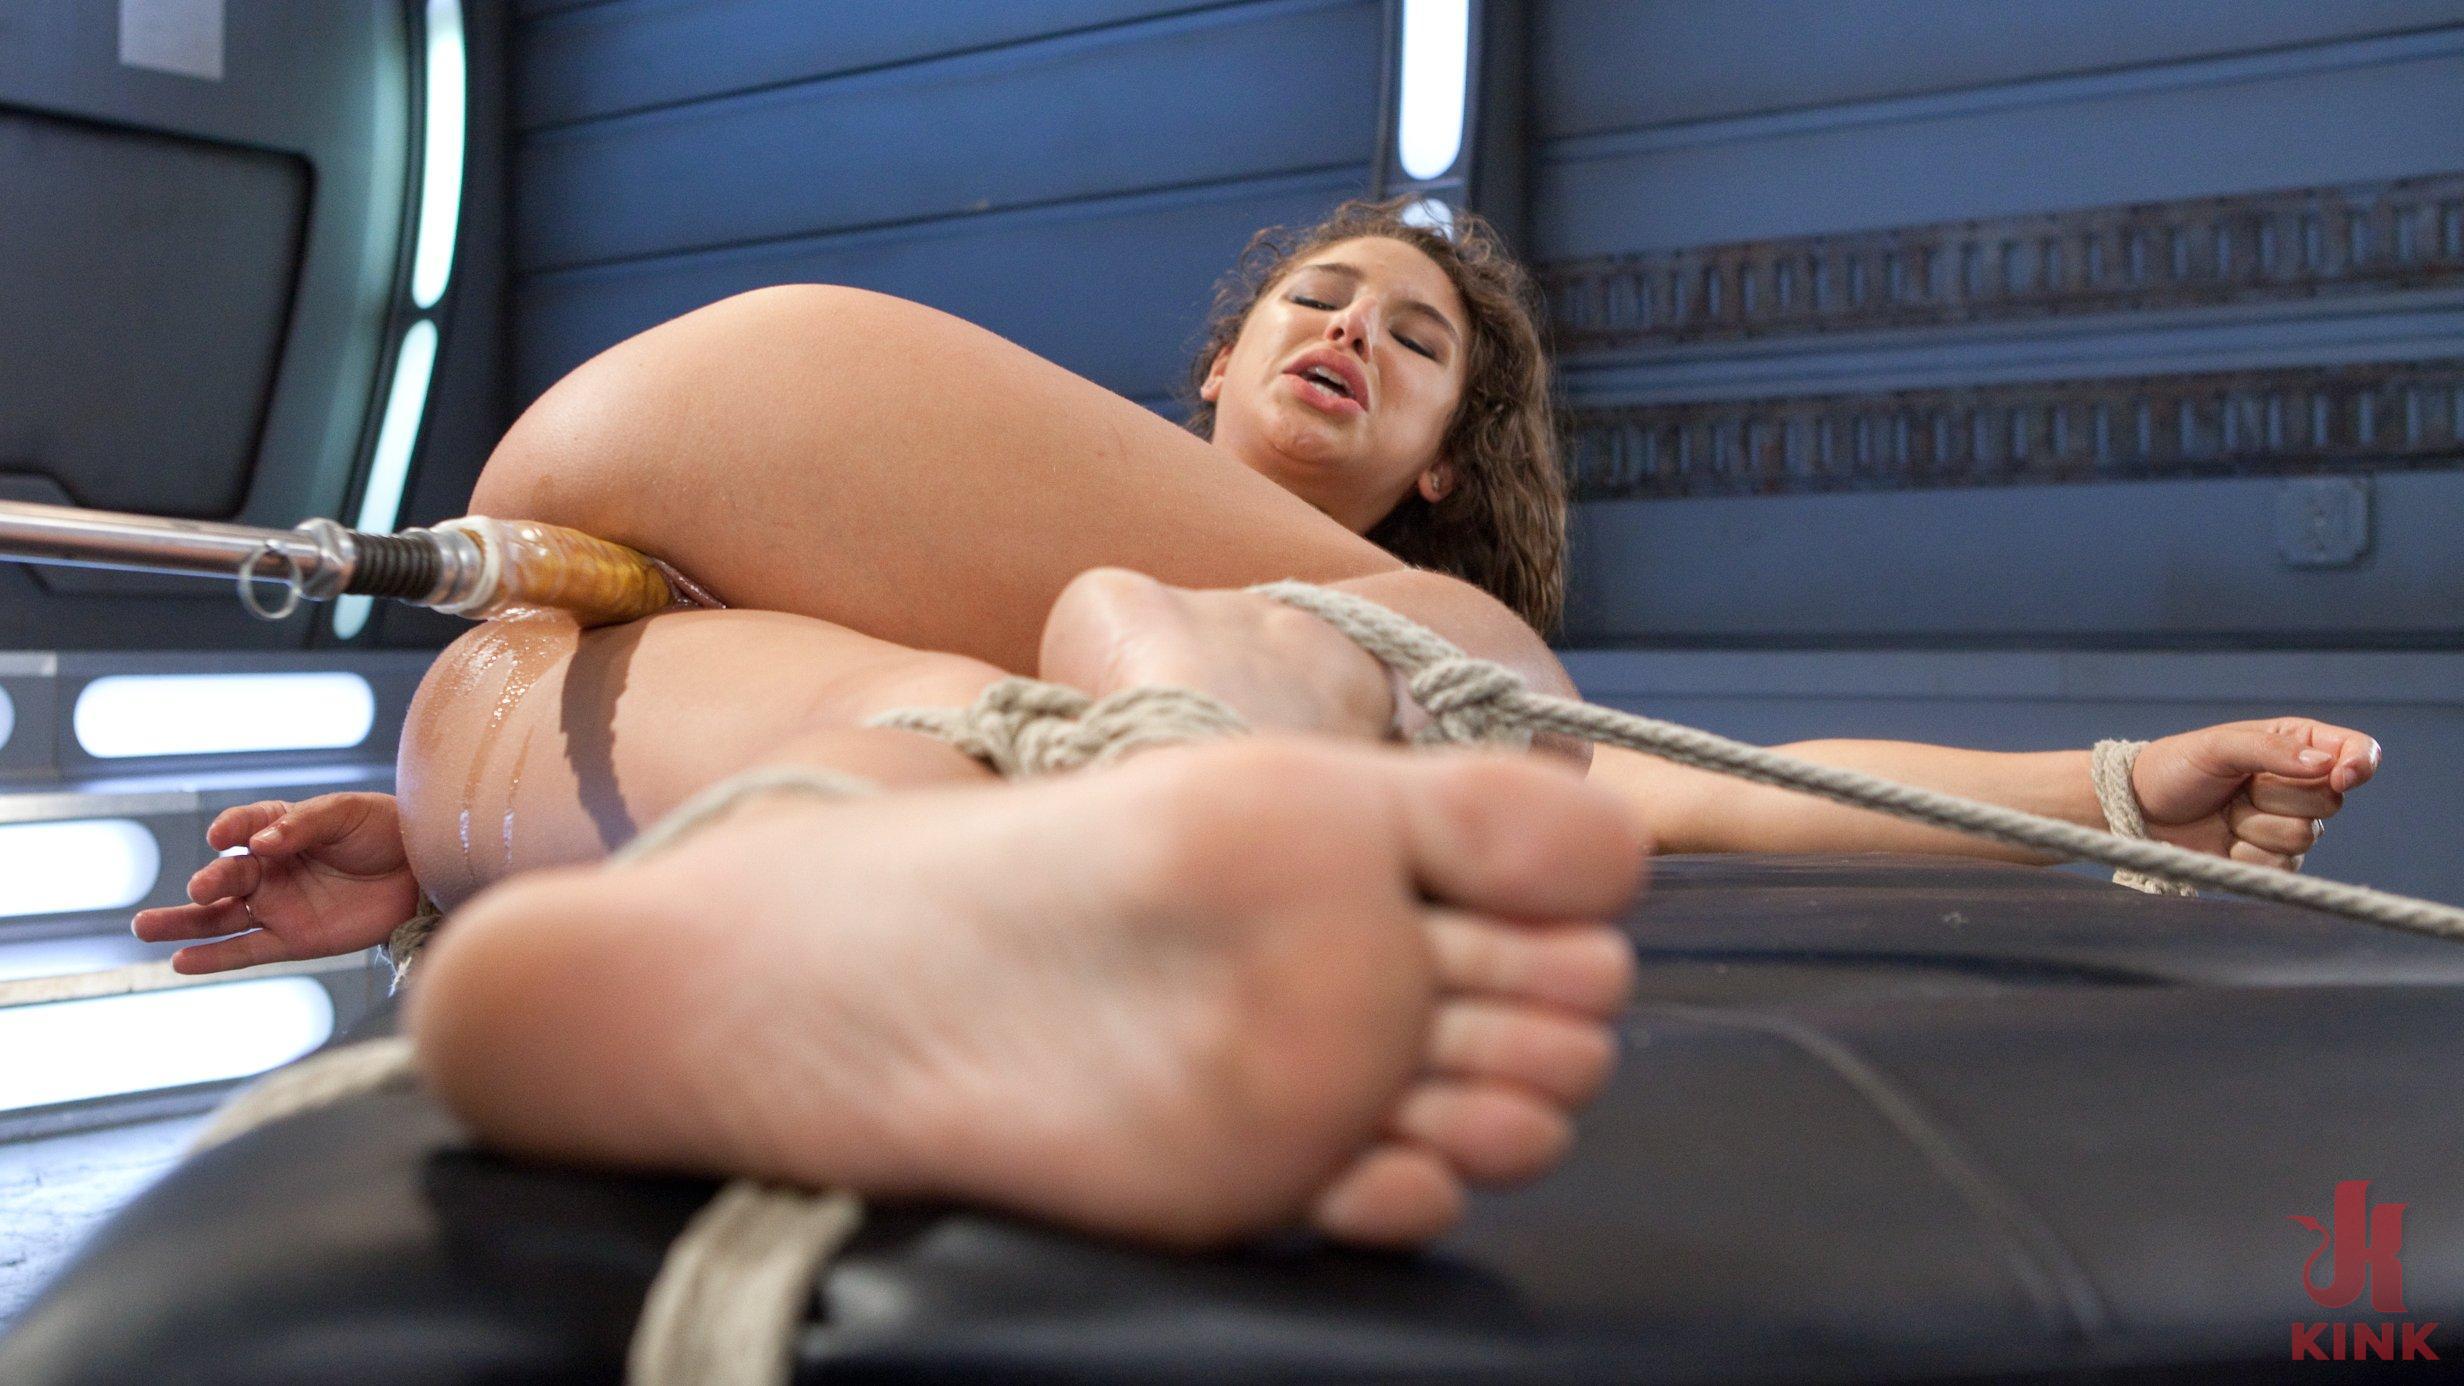 Opinion, false Xlxx machine tied girl idea))))